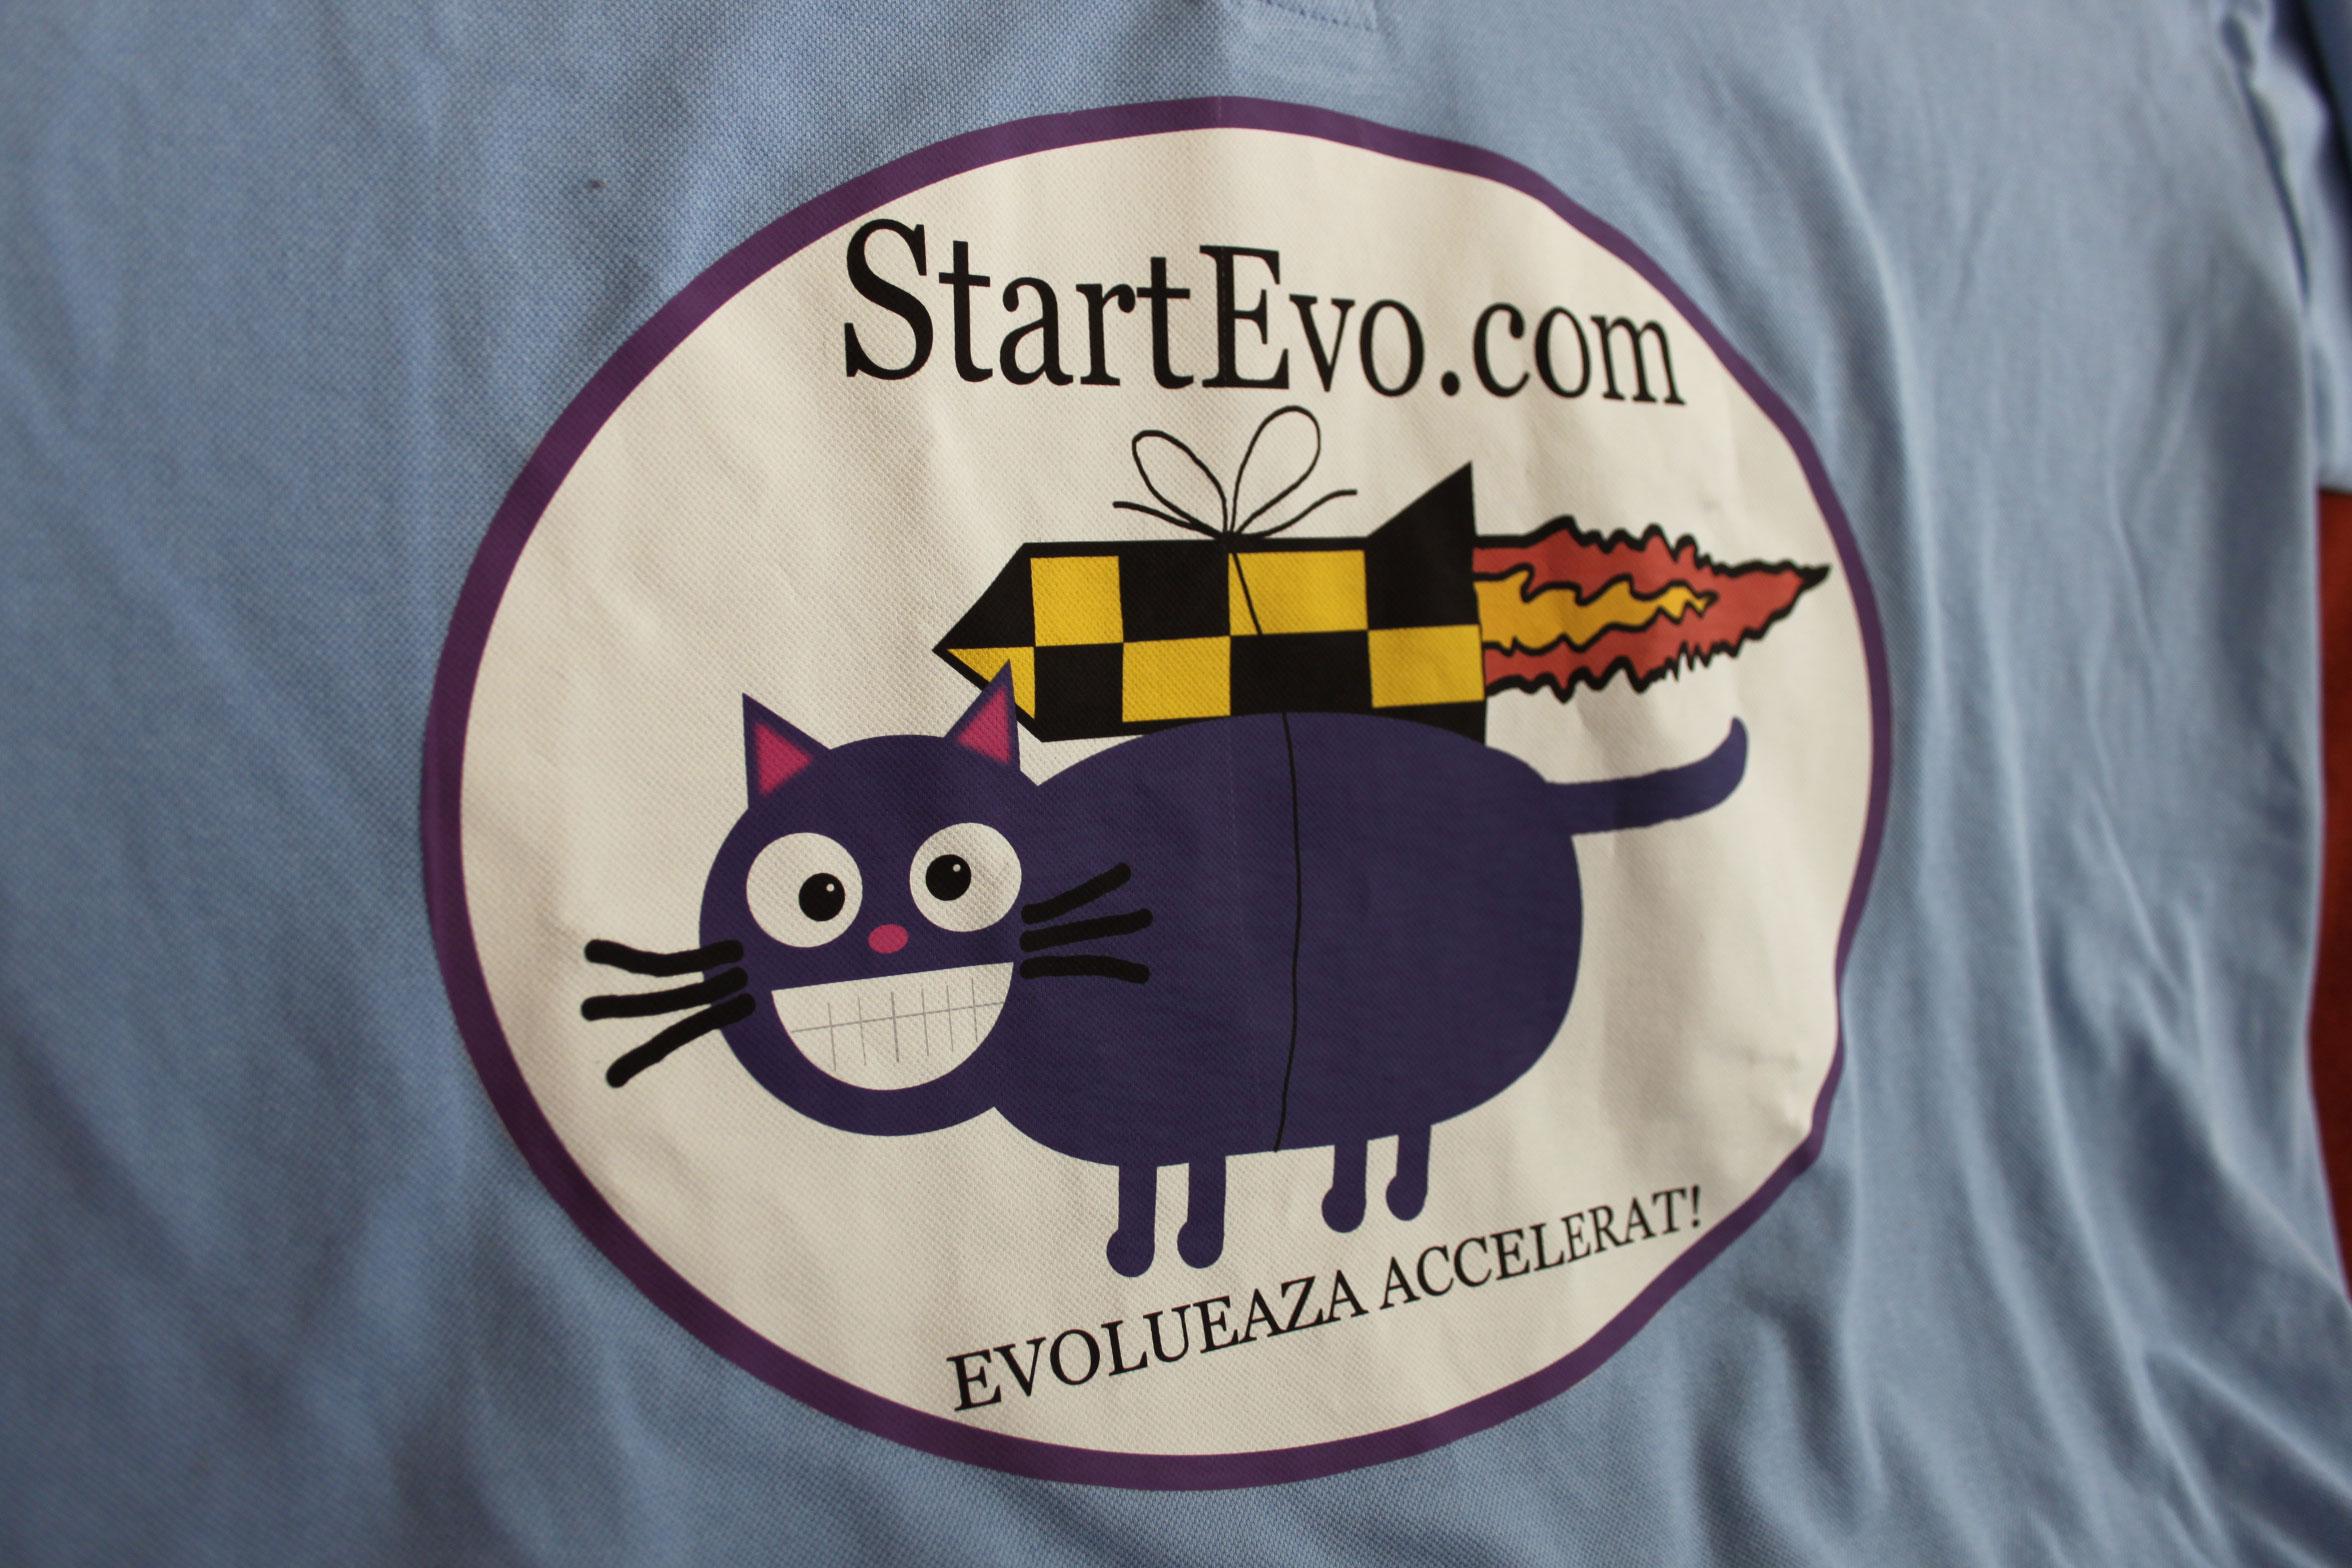 StartEvo pe mega tricou :)